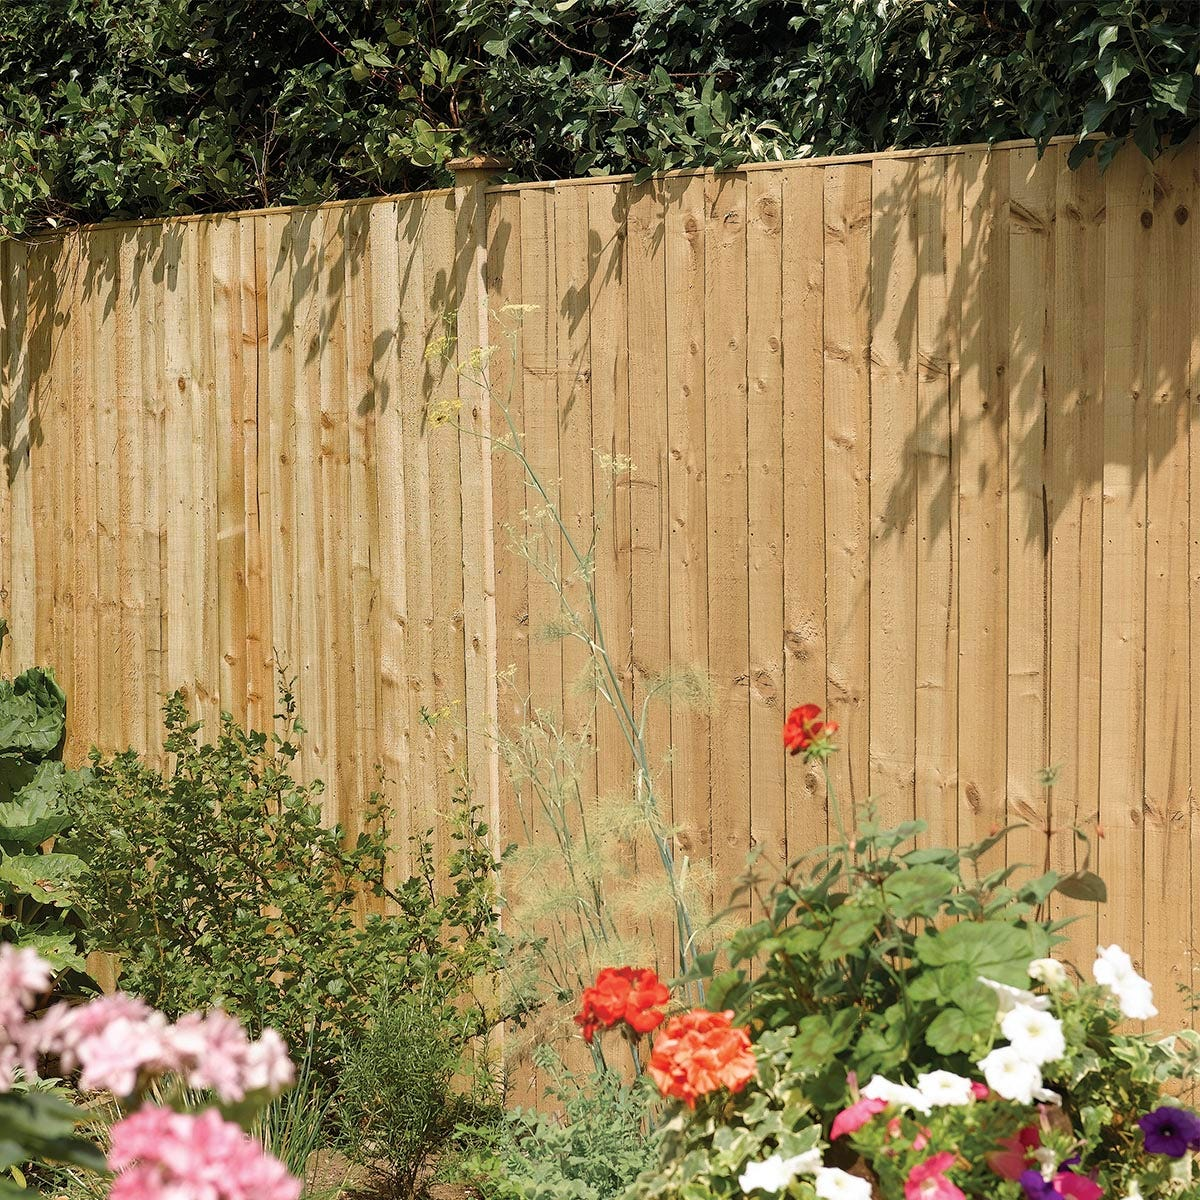 Rowlinson 3pk Vertical Board Panel Pressure Treated Fence - 6x6